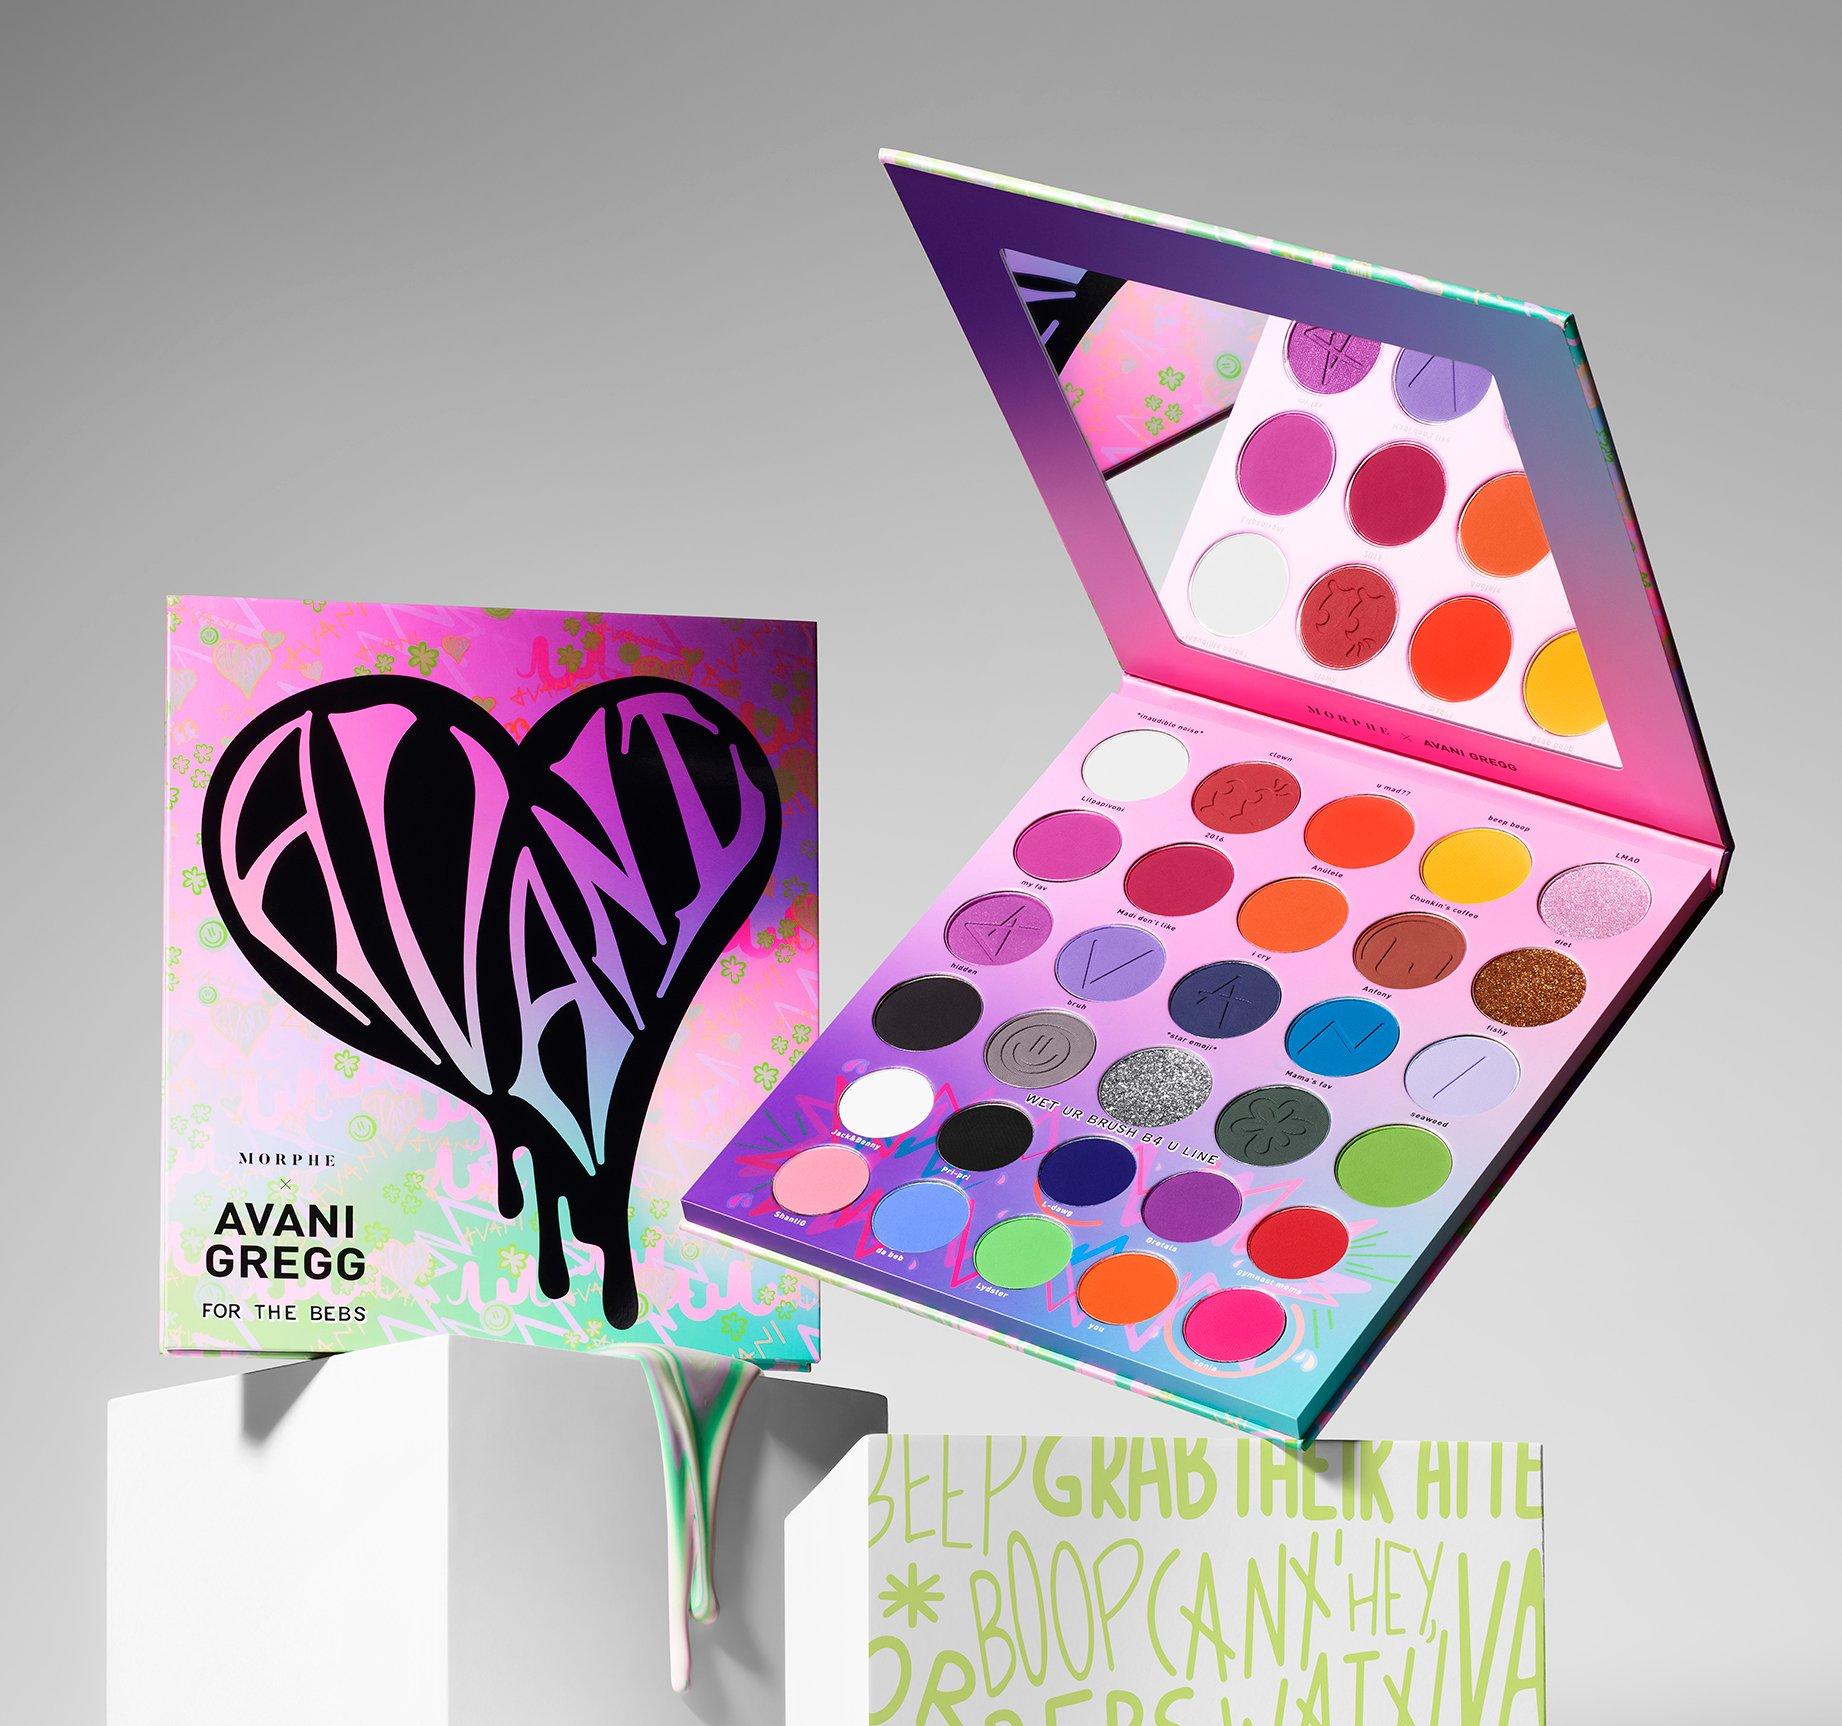 Paleta de sombras, ojos, maquillaje, Morphe, Avani Gregg